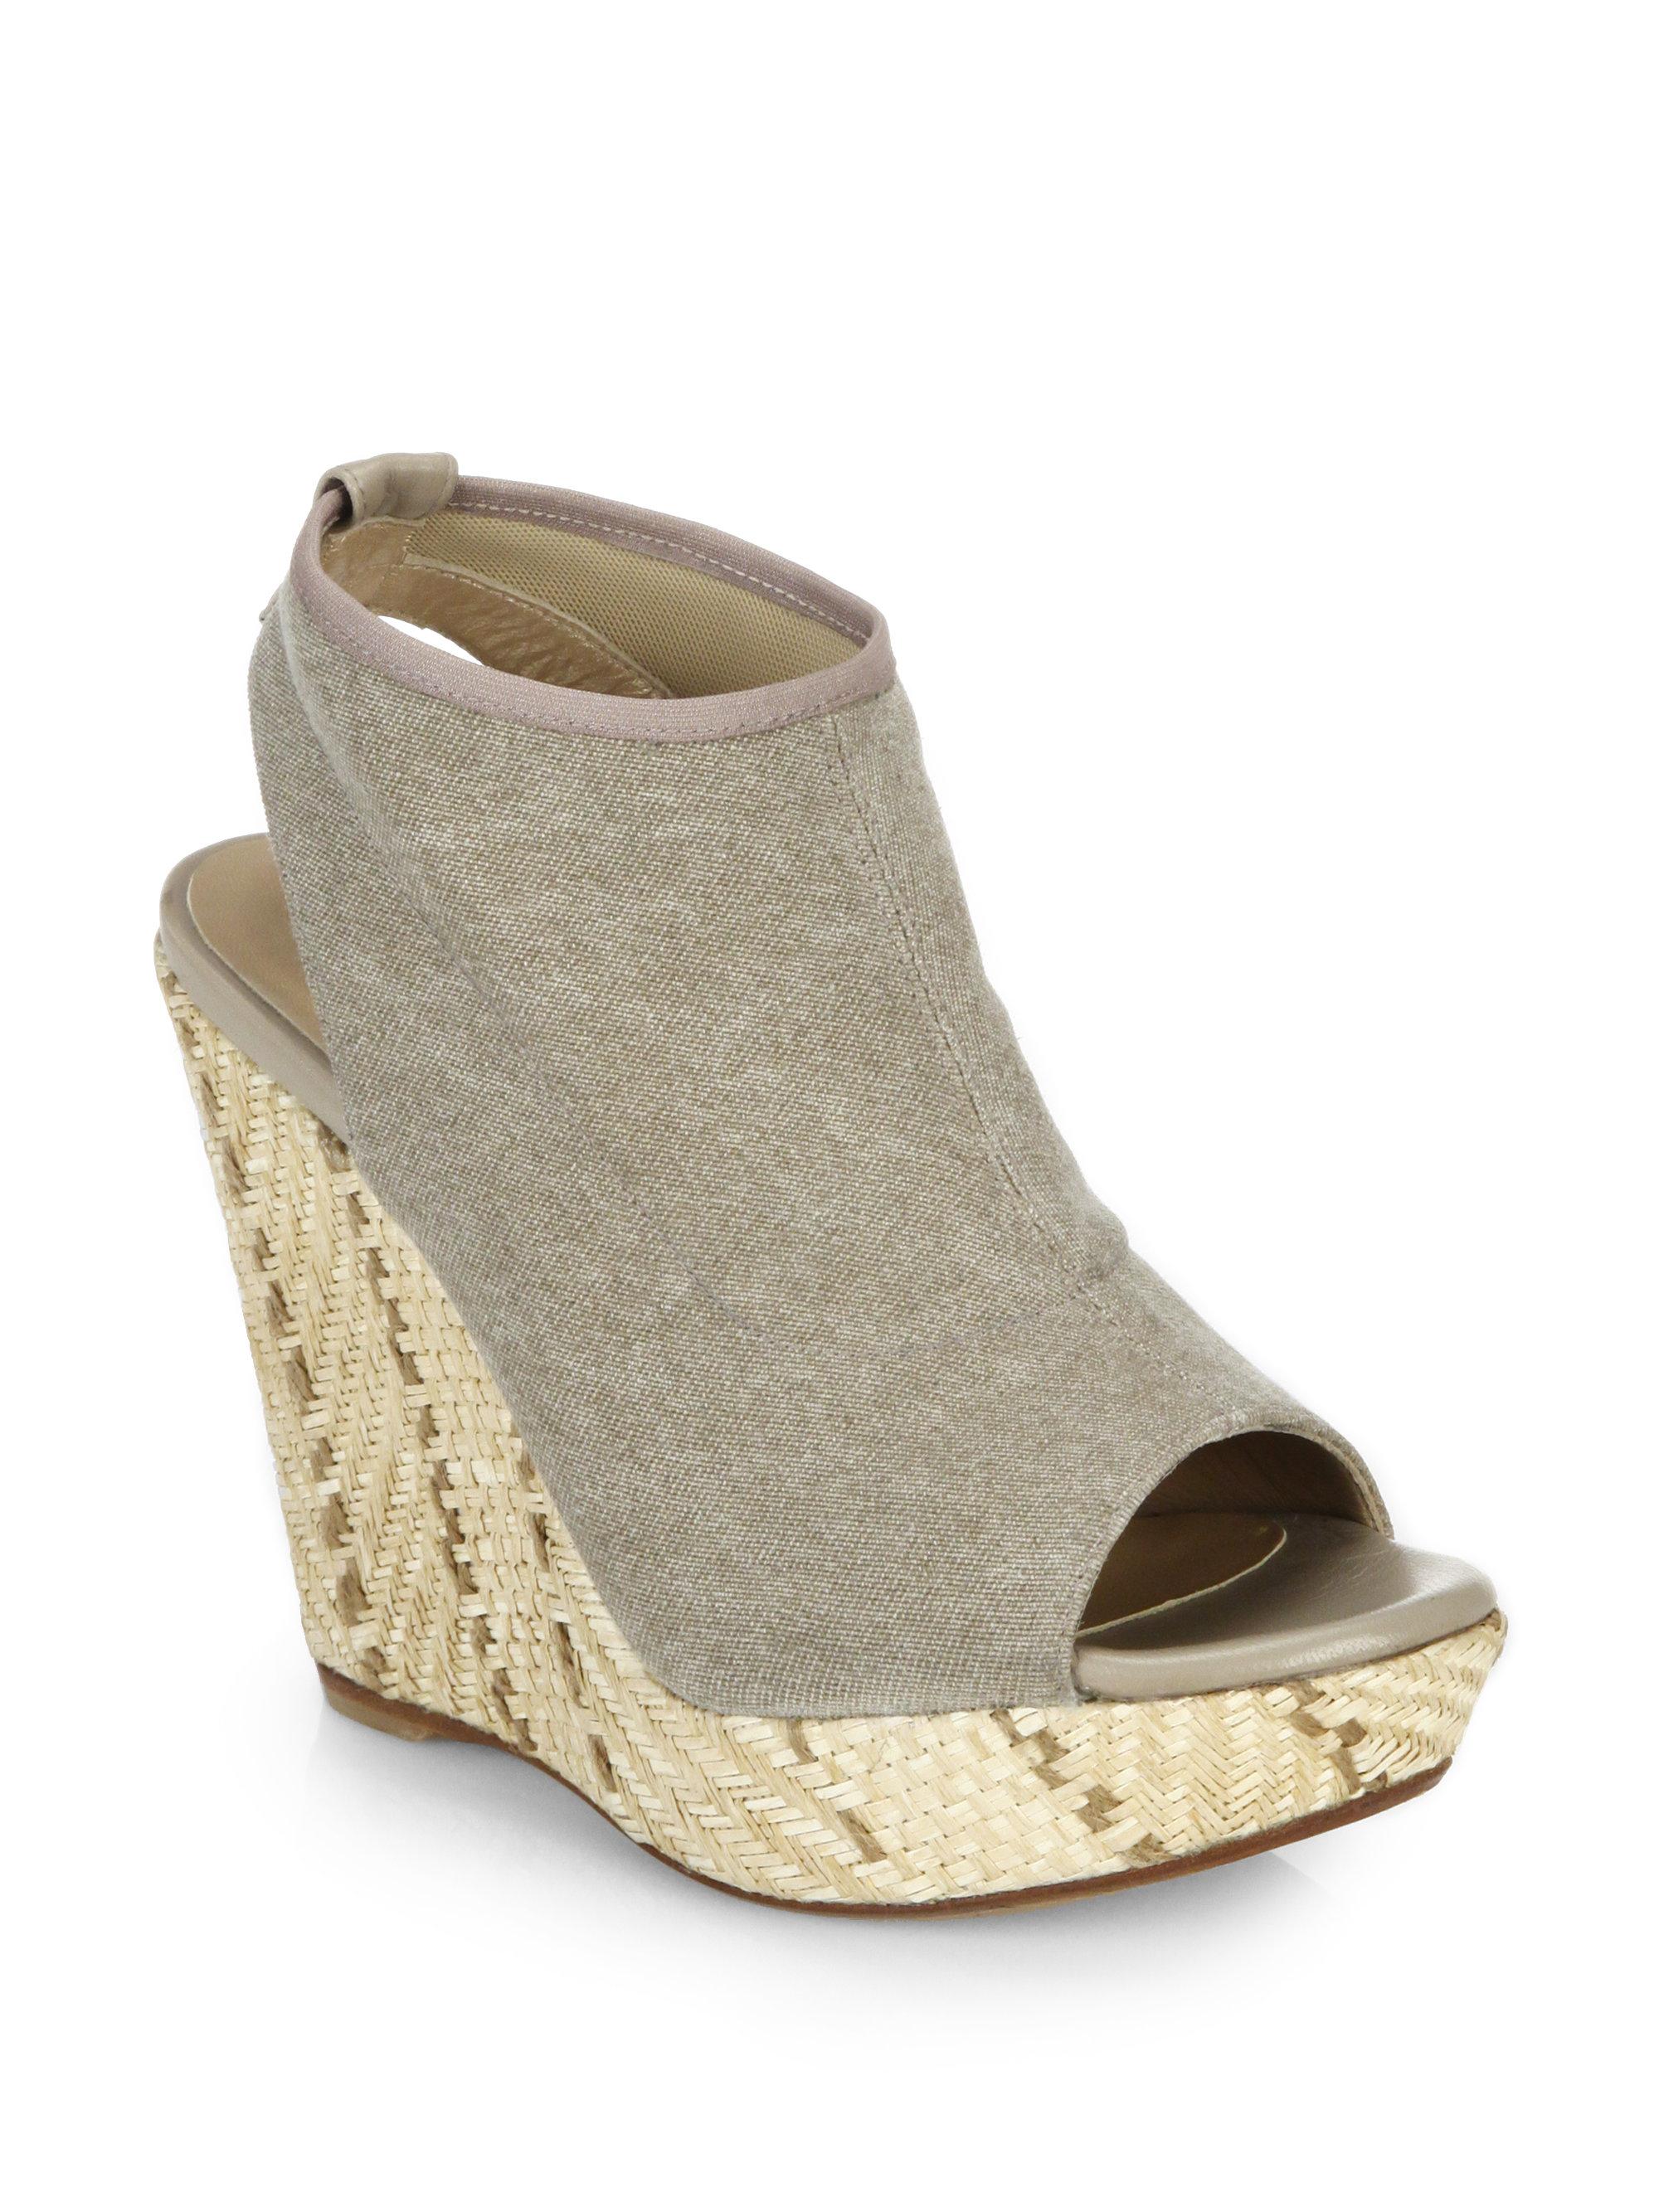 6fcc35dfa75 Lyst - Stuart Weitzman Espadrille Wedge Sandals in Gray